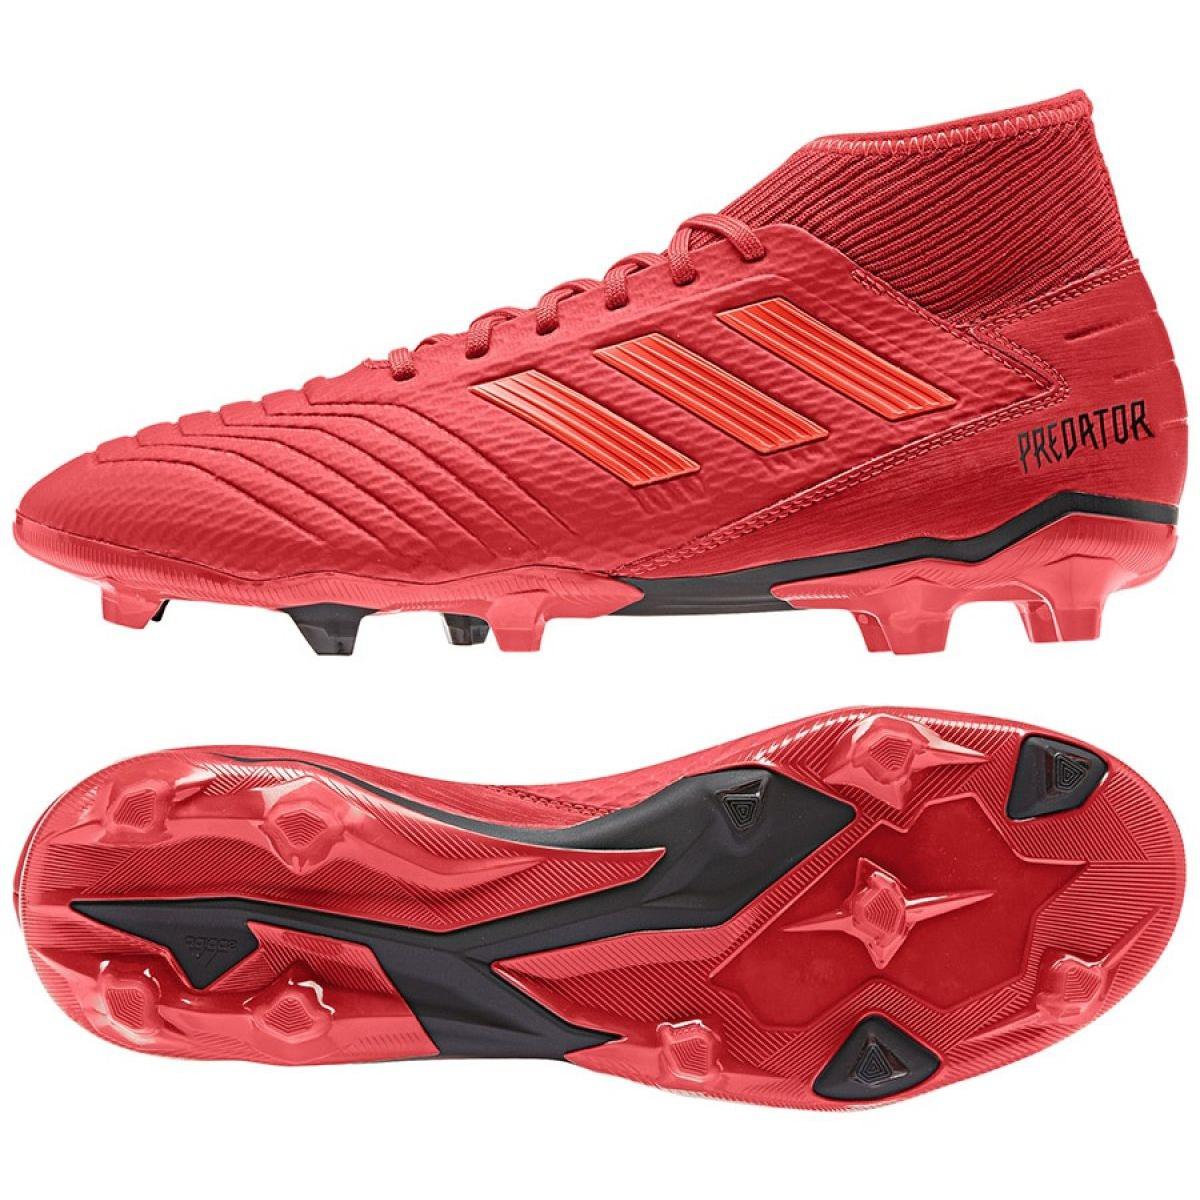 Chaussures de foot ADIDAS ProugeATOR 19.3 FG M bb9334